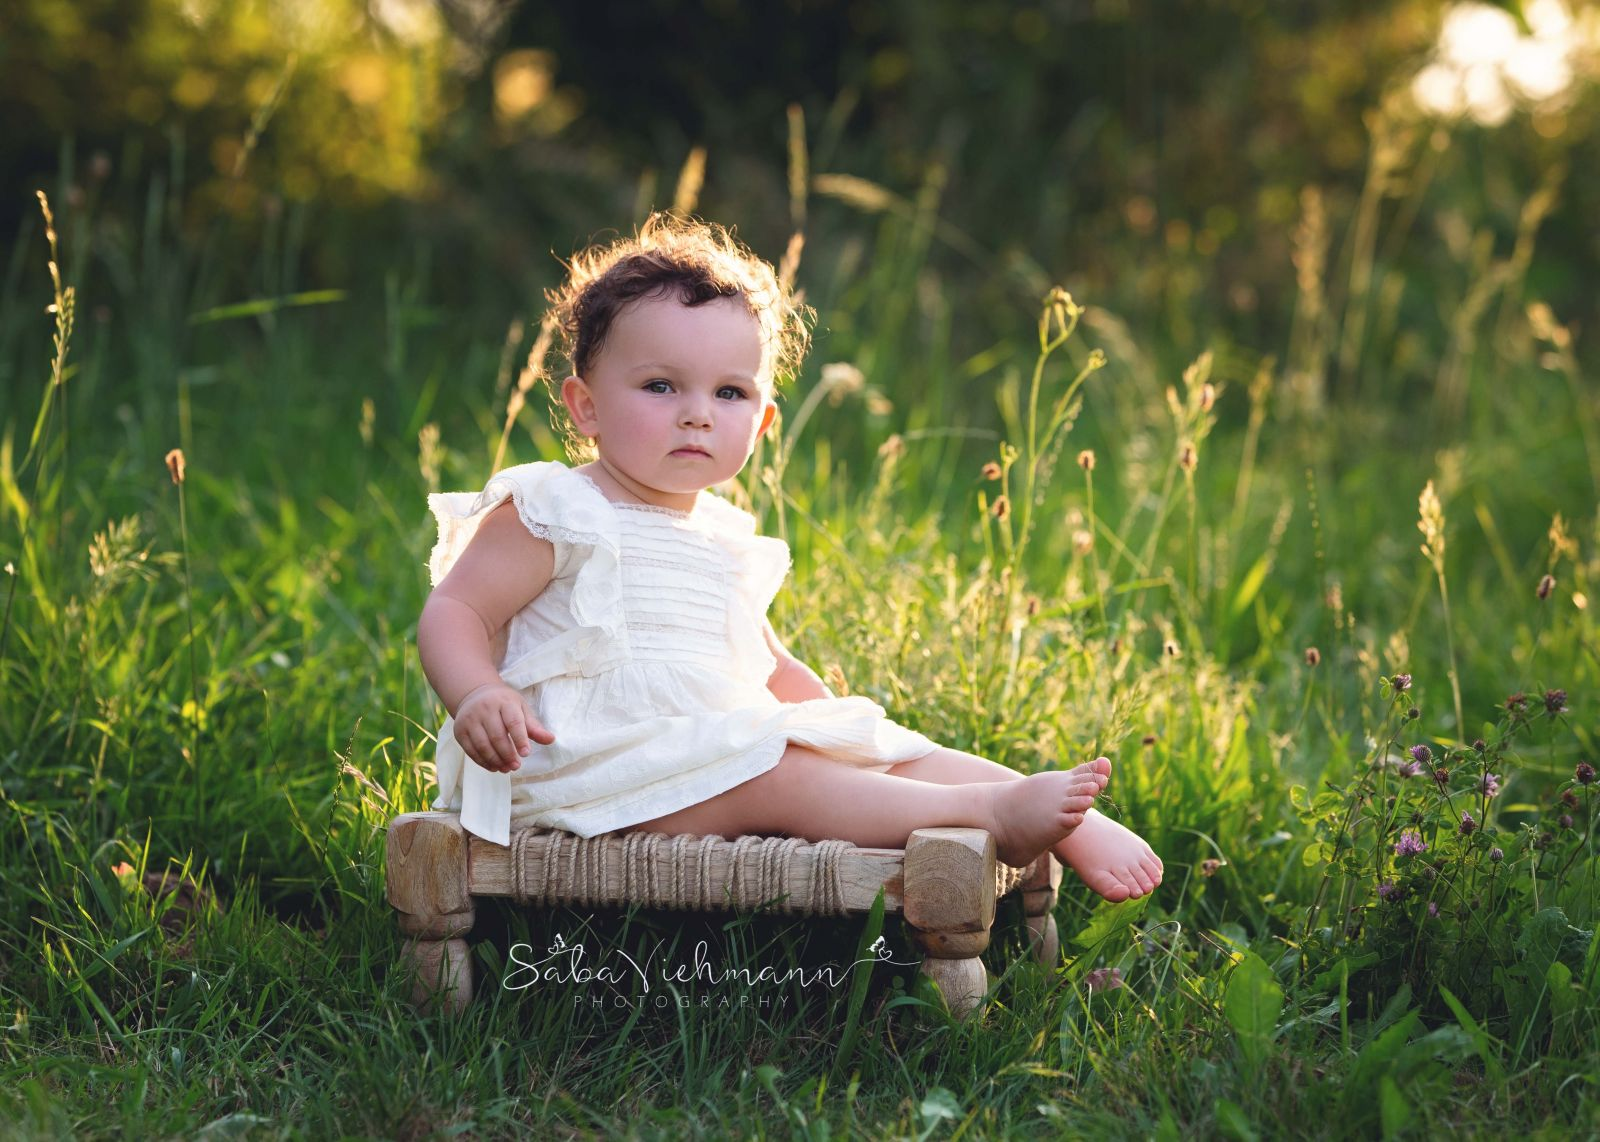 saba Viehmann fotografie   fotostudio gießen   babyfotografie   babyfotograf   babyfotostudio   babyfotos   neugeborenenfotos   schwangerschaftsfotos   fotograf